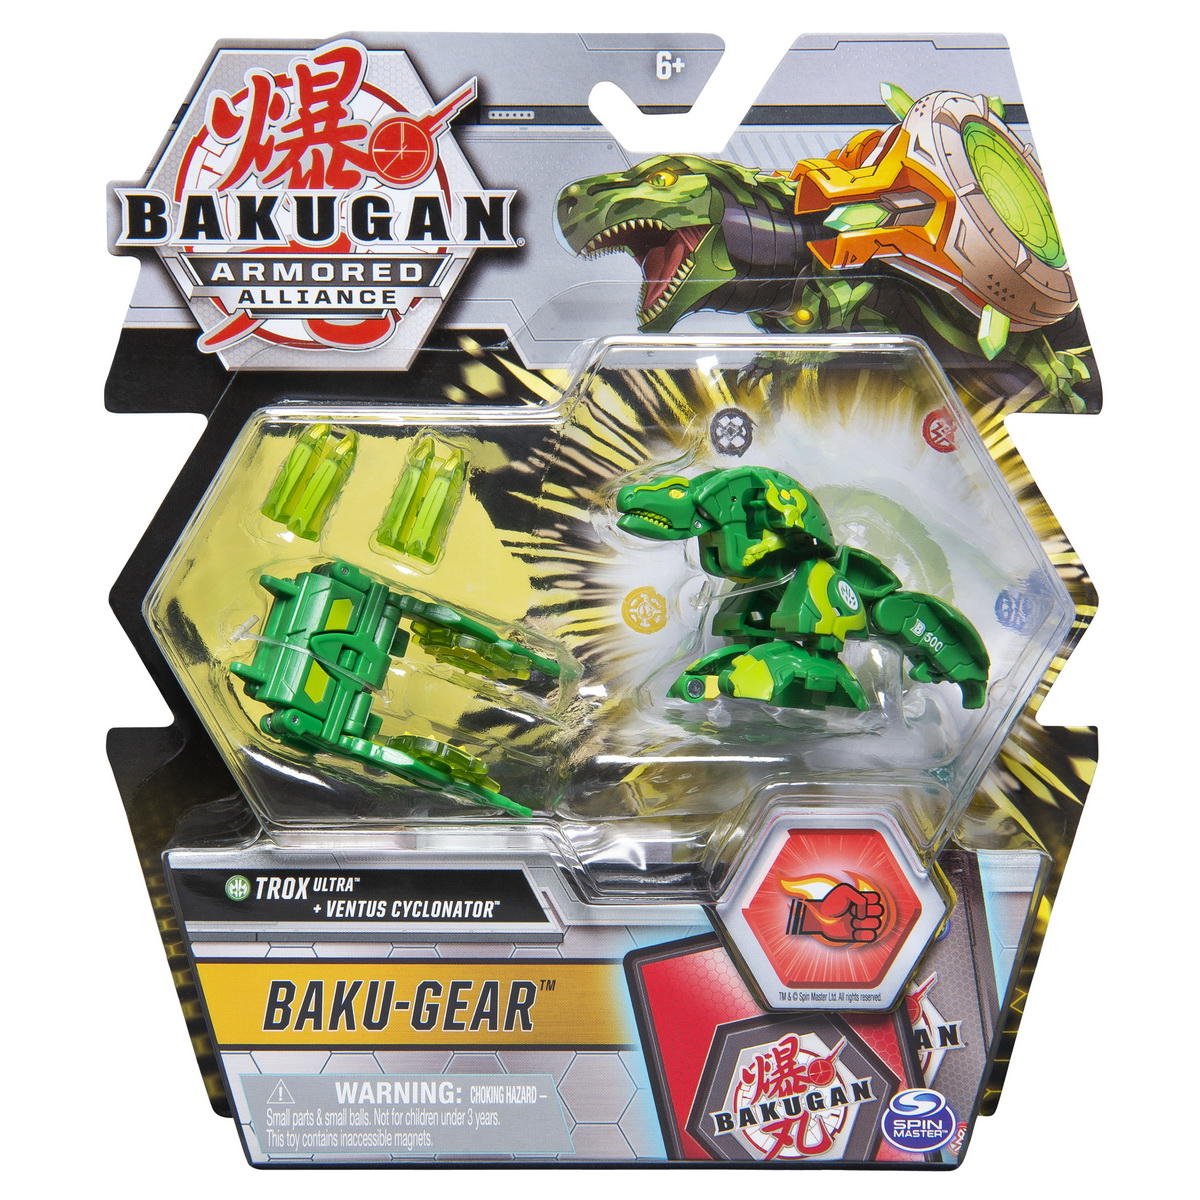 Bakugan S2 Bila Ultra Trox Cu Echipament Baku-gear Ventus Cyclonator